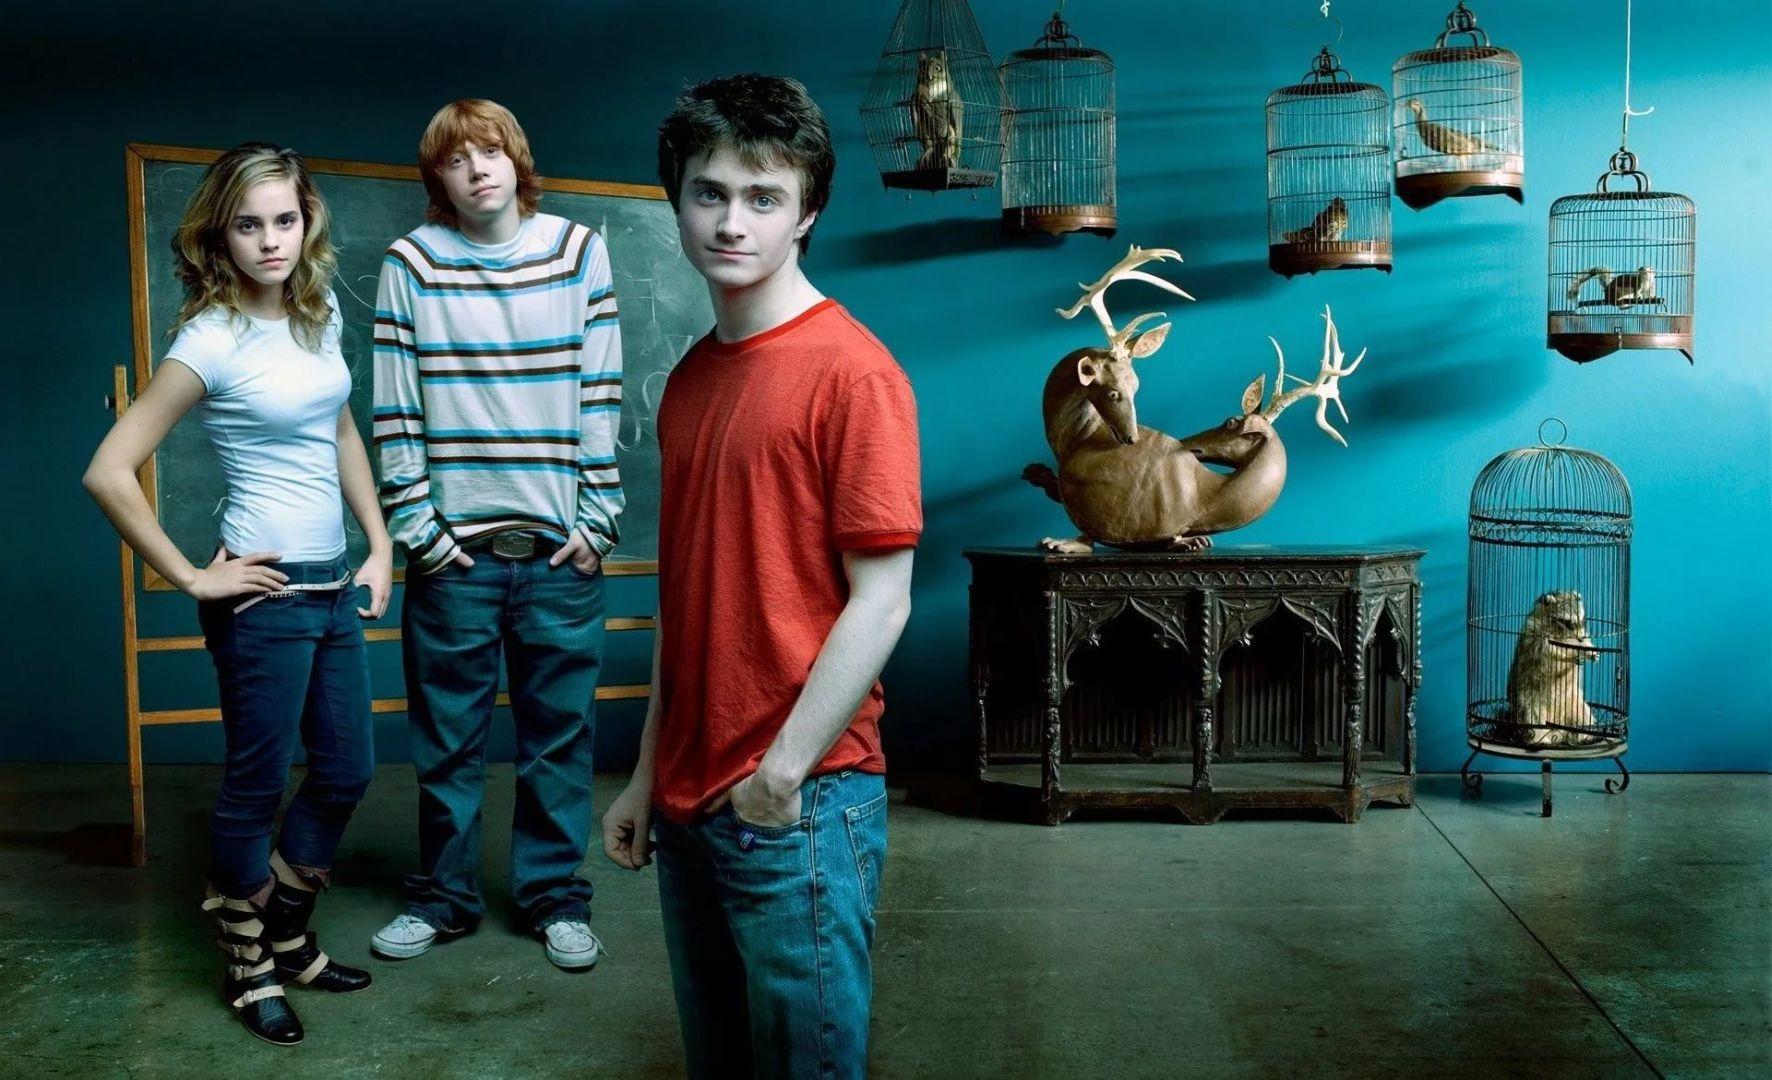 Harry Potter hd wallpaper 1080